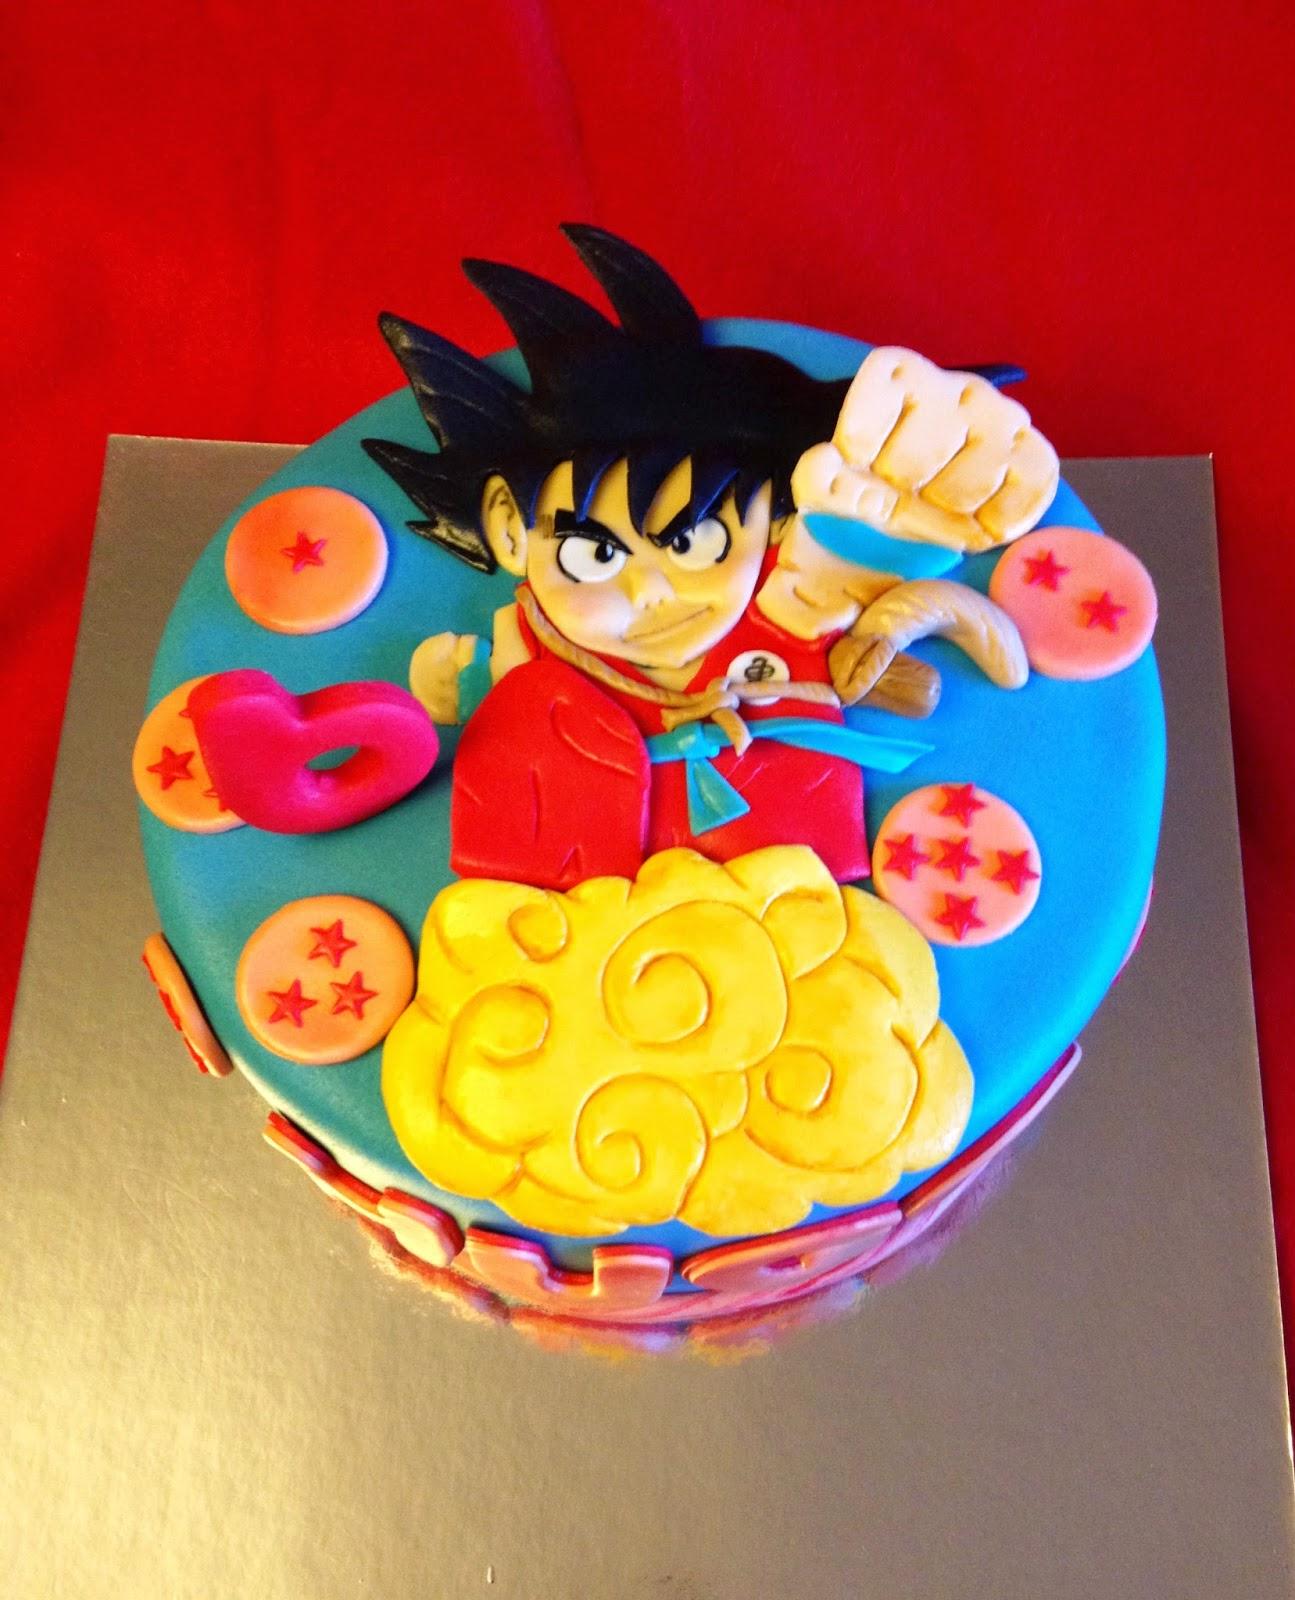 goku; bola de dragón; bola dragon; tarta fondant, tarta decorada; tarta goku; tarta fondant goku; tarta fondant bola de dragon